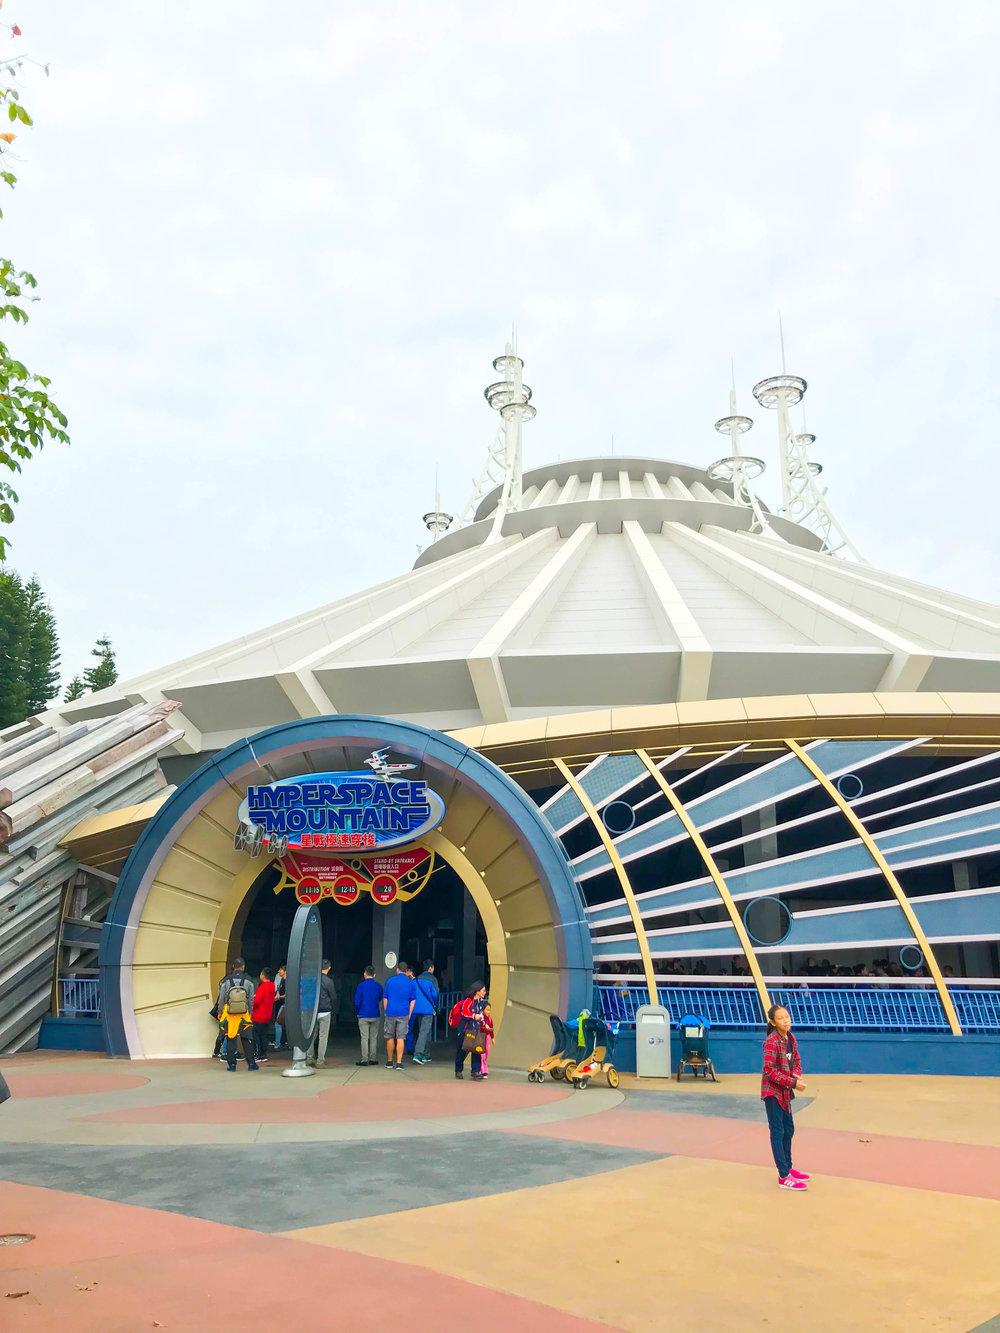 Hong Kong Disneyland Tomorrowland - Space Mountain